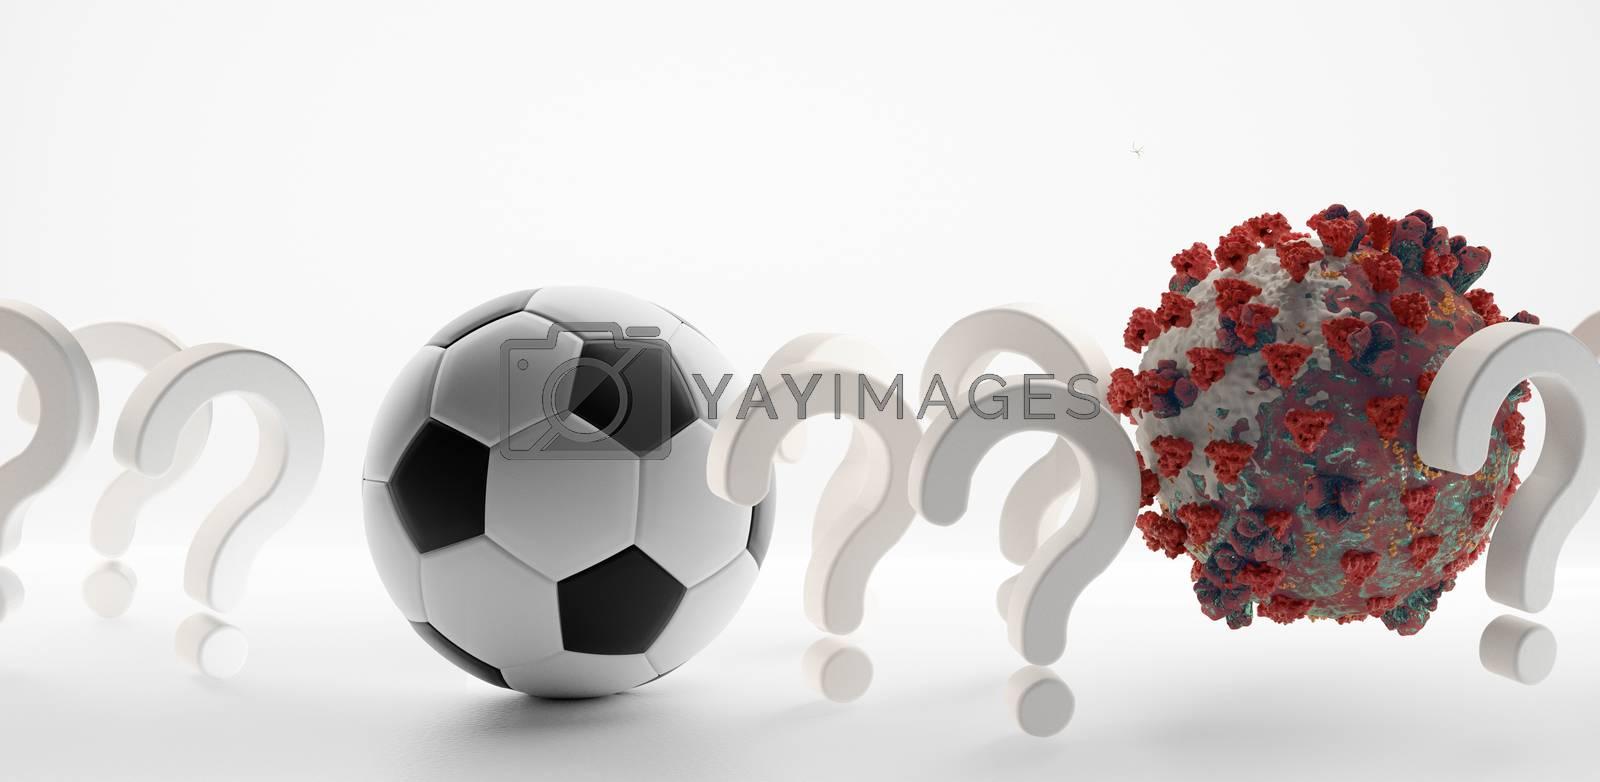 soccer ball question marks Coronavirus Covid-19 symbolic 3d-illustration